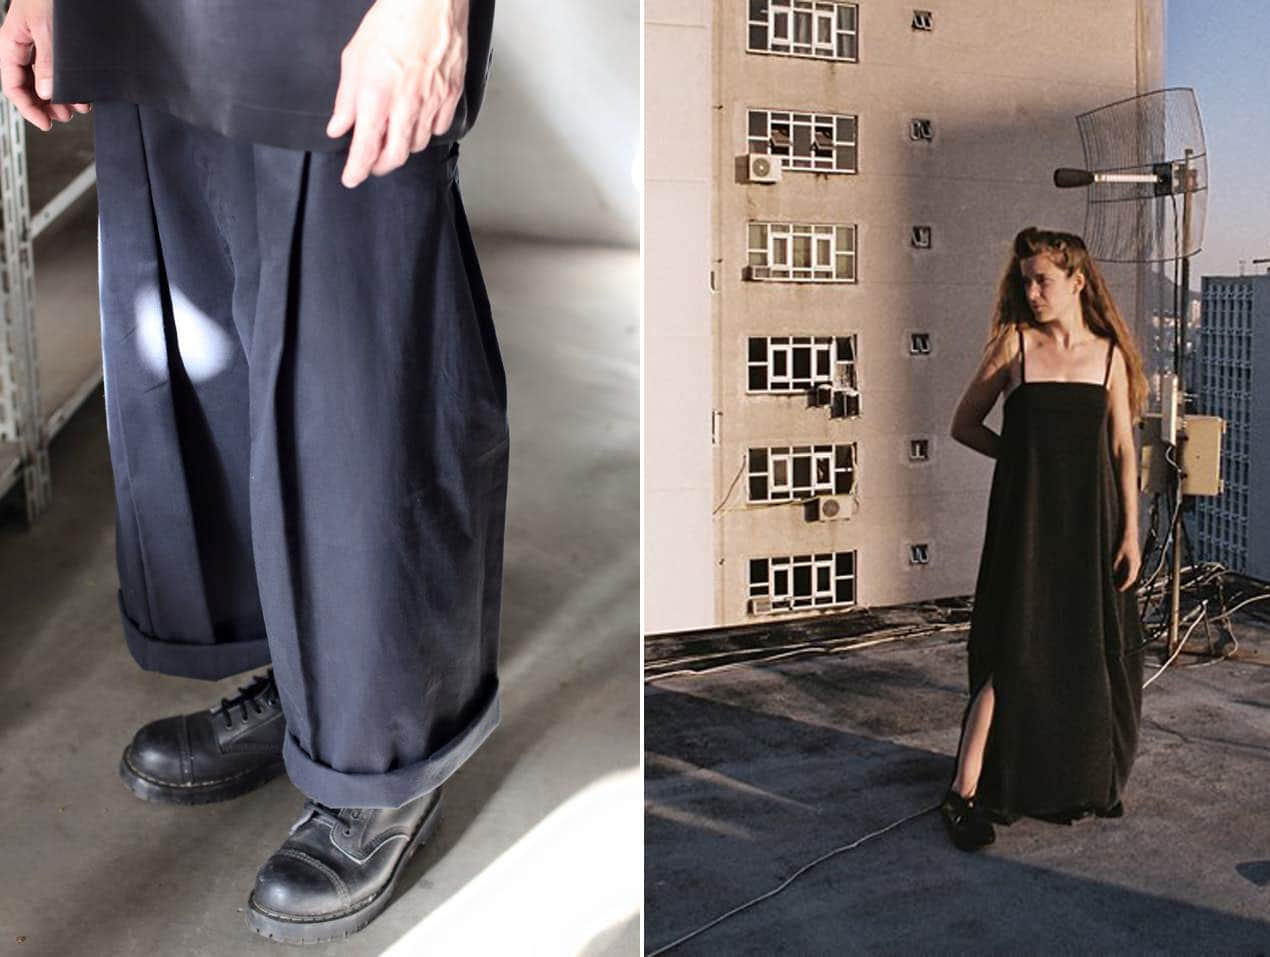 moda-unissex-plurissex-beira-marca